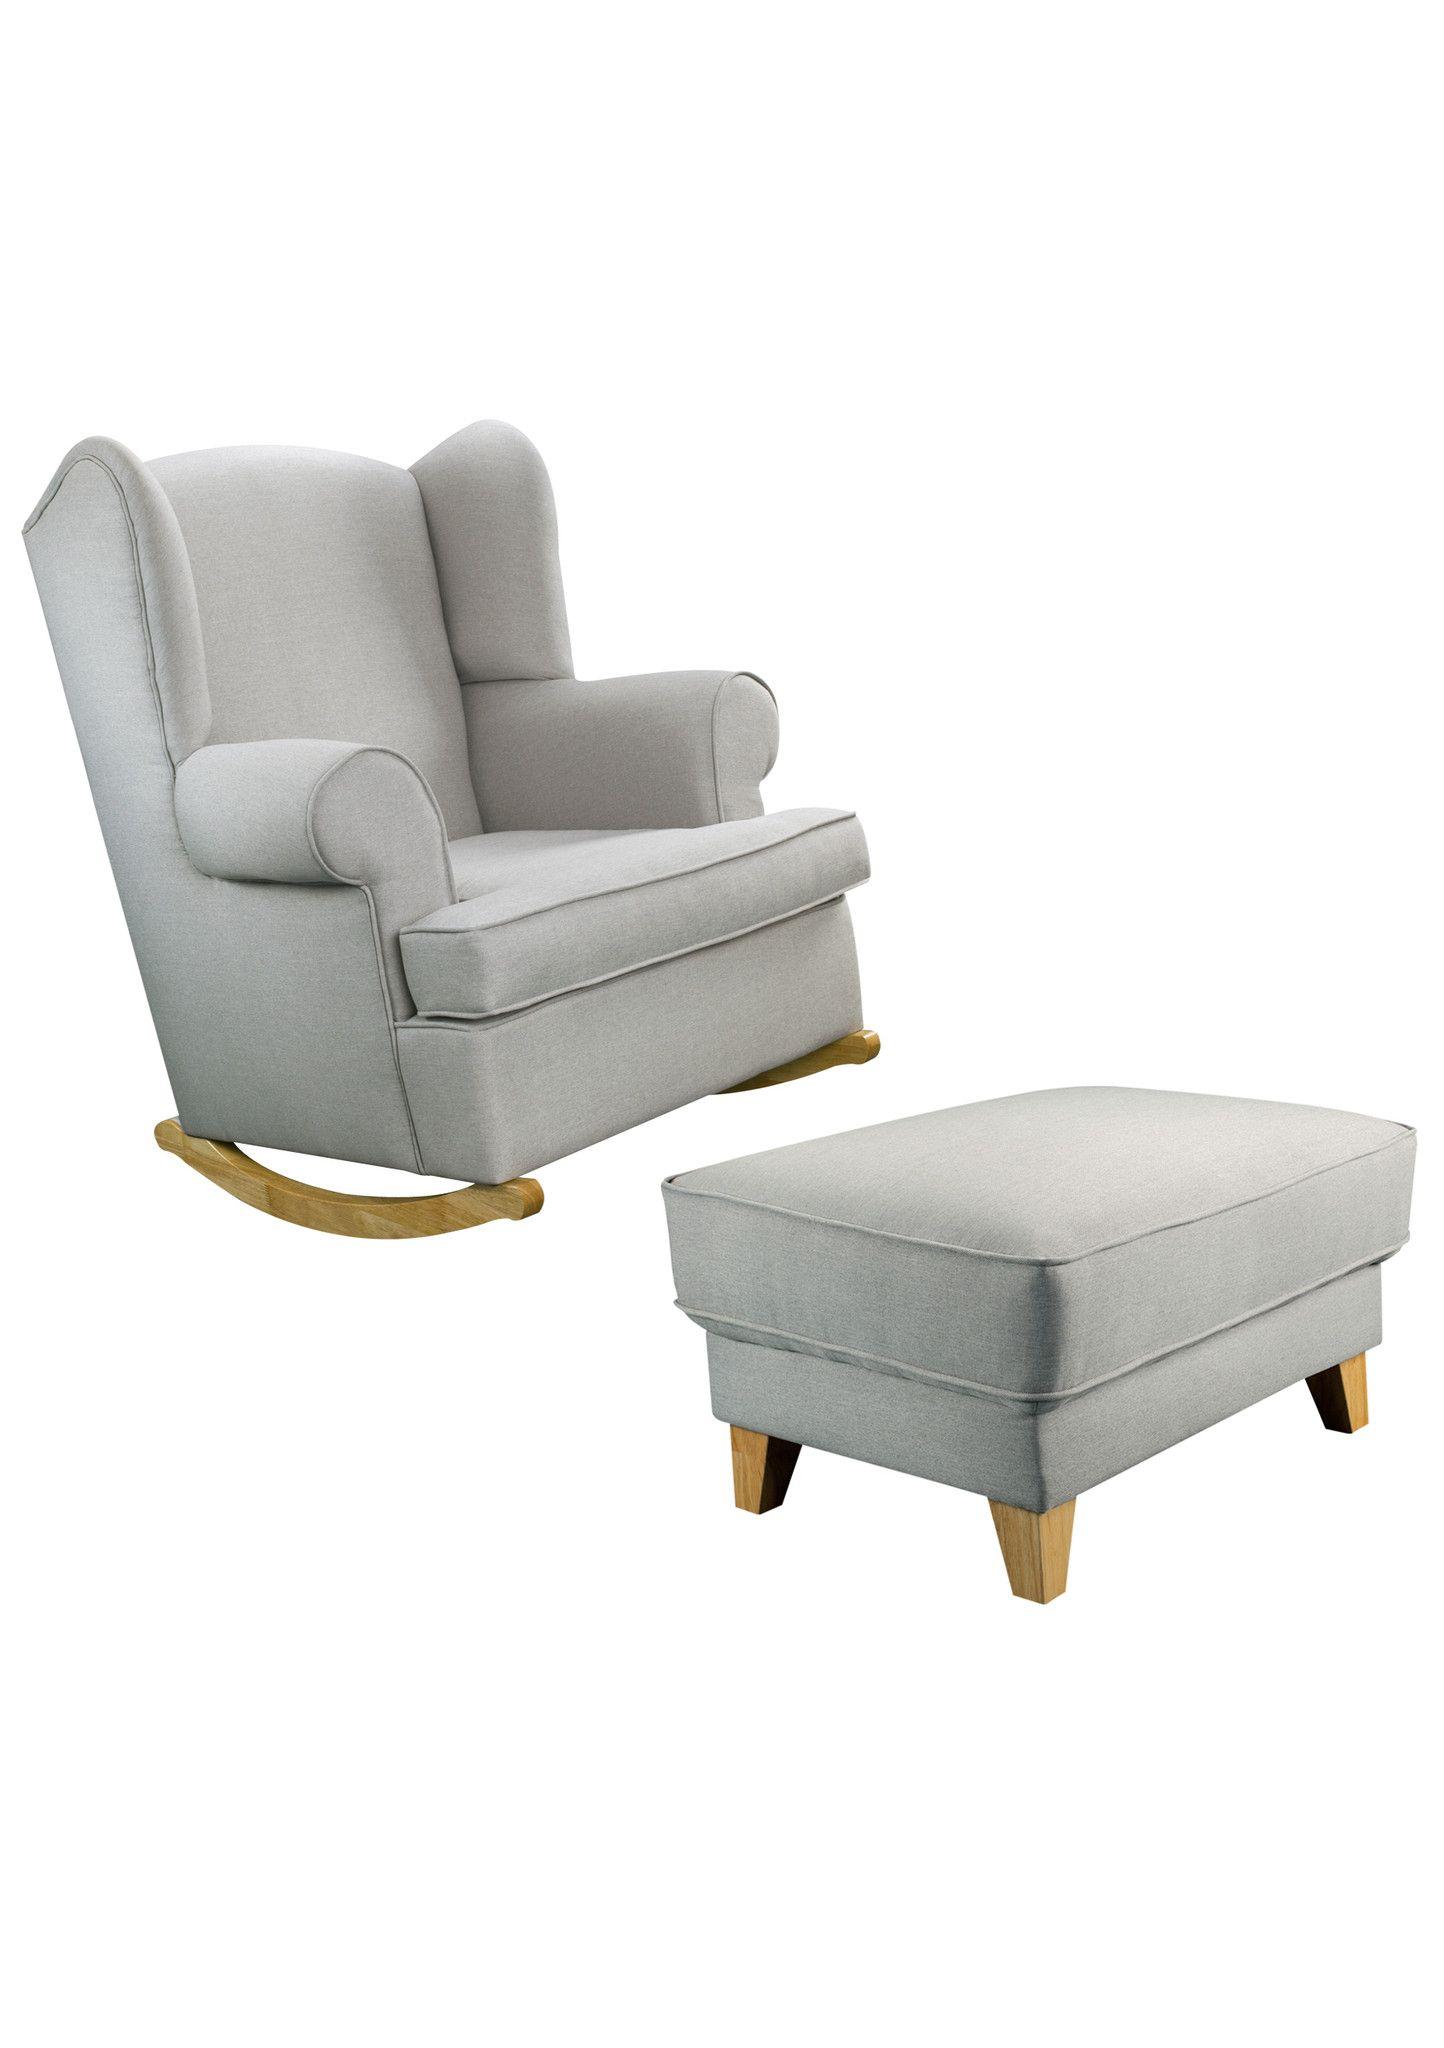 Geor own rocking chair